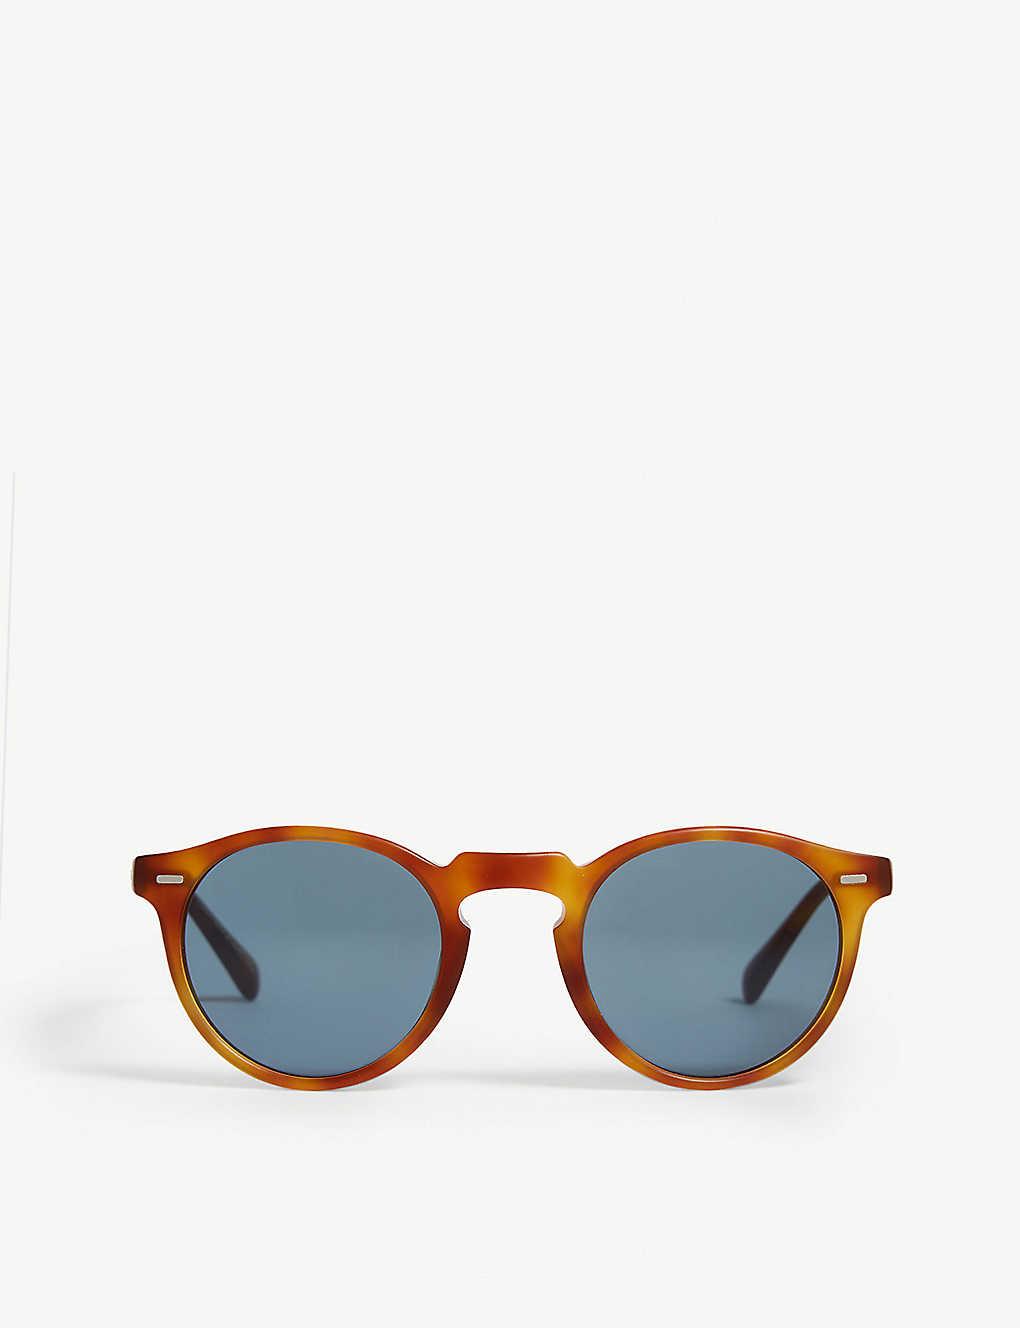 5e4c0cdddd91 OLIVER PEOPLES - Gregory Peck tortoiseshell round-frame sunglasses ...